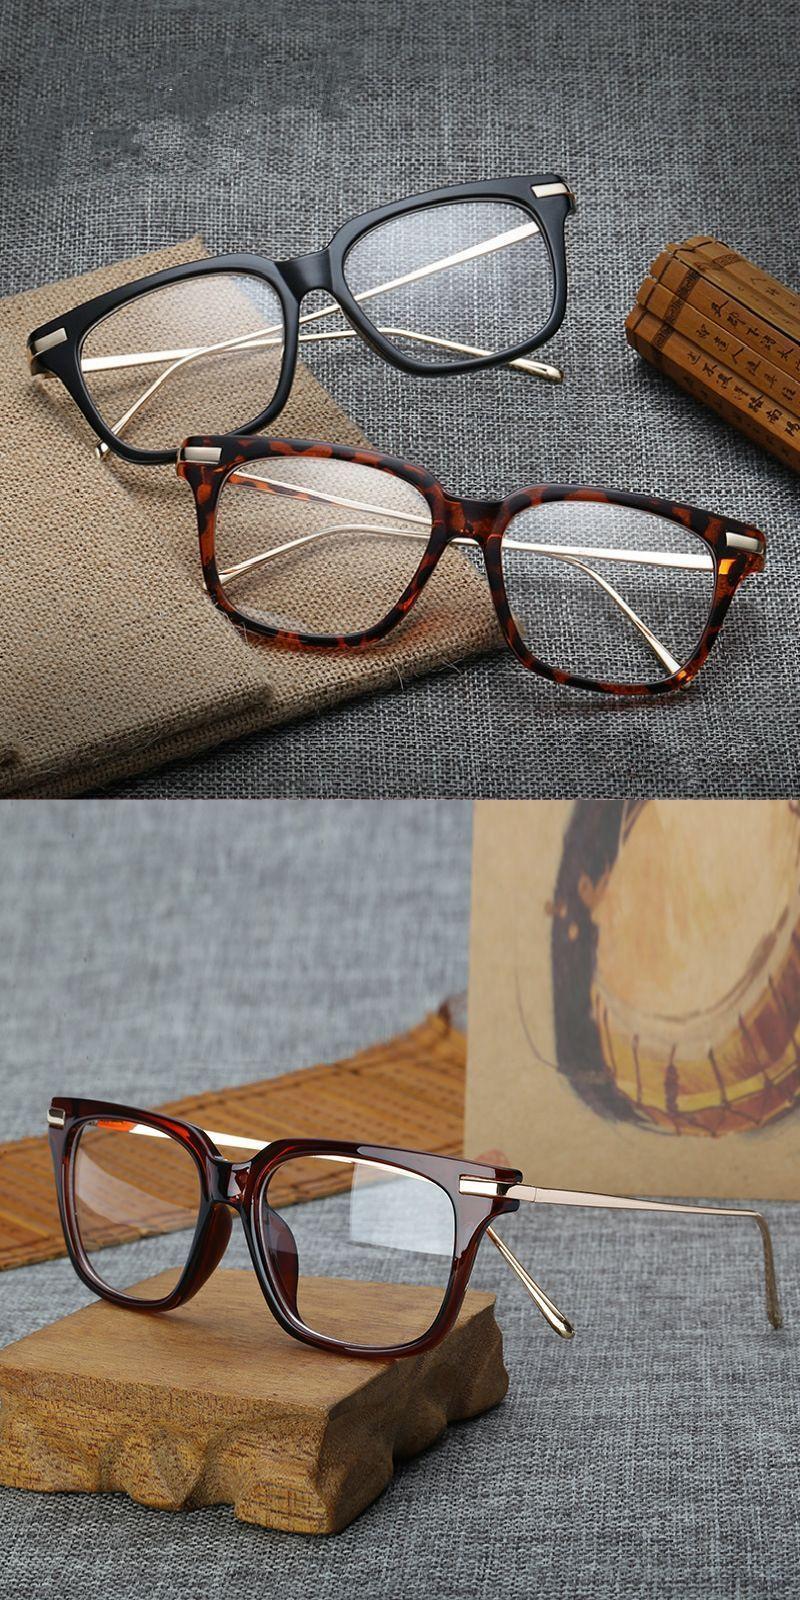 c78516507b Reteo eyeglasses frame brand design transparent women men optical eyewear  glasses myopia computer glasses frame